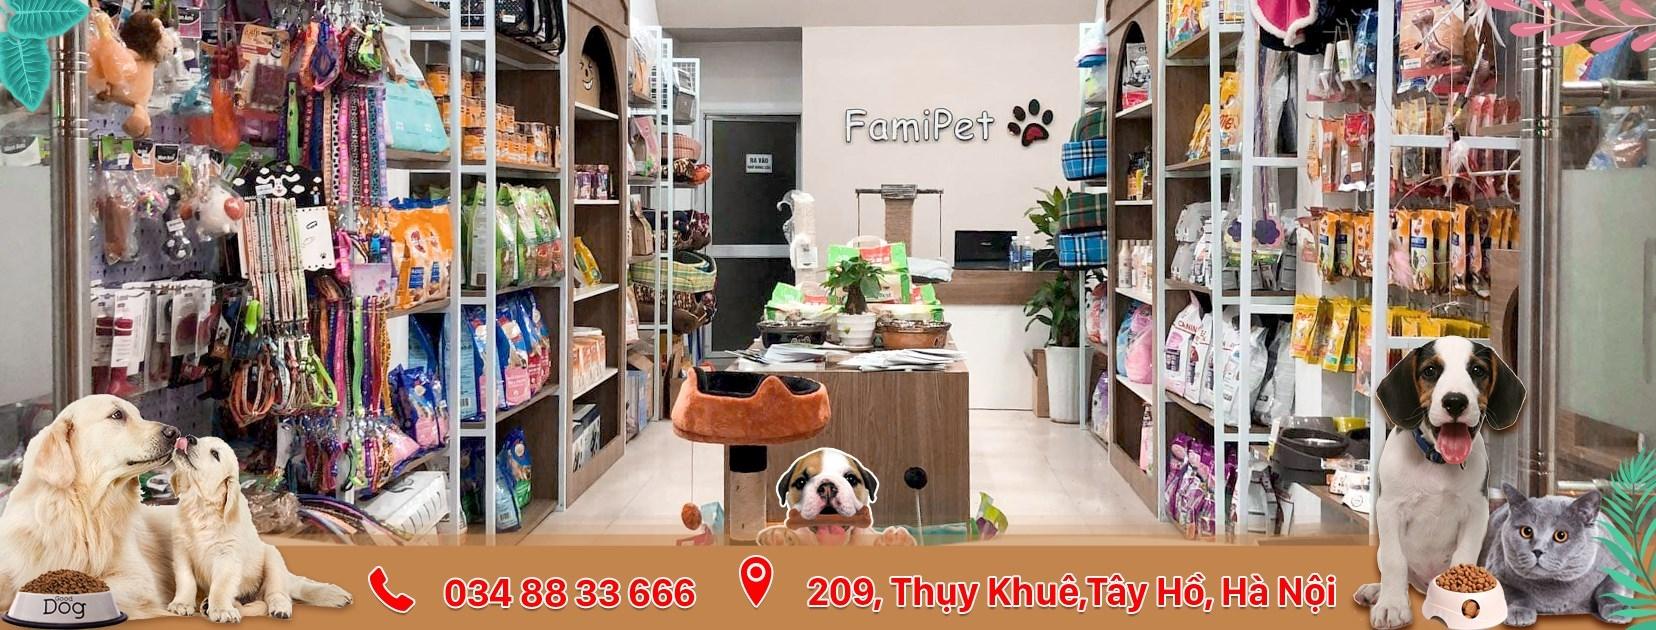 shop thu cung famipet (@shopthucungfamipet) Cover Image